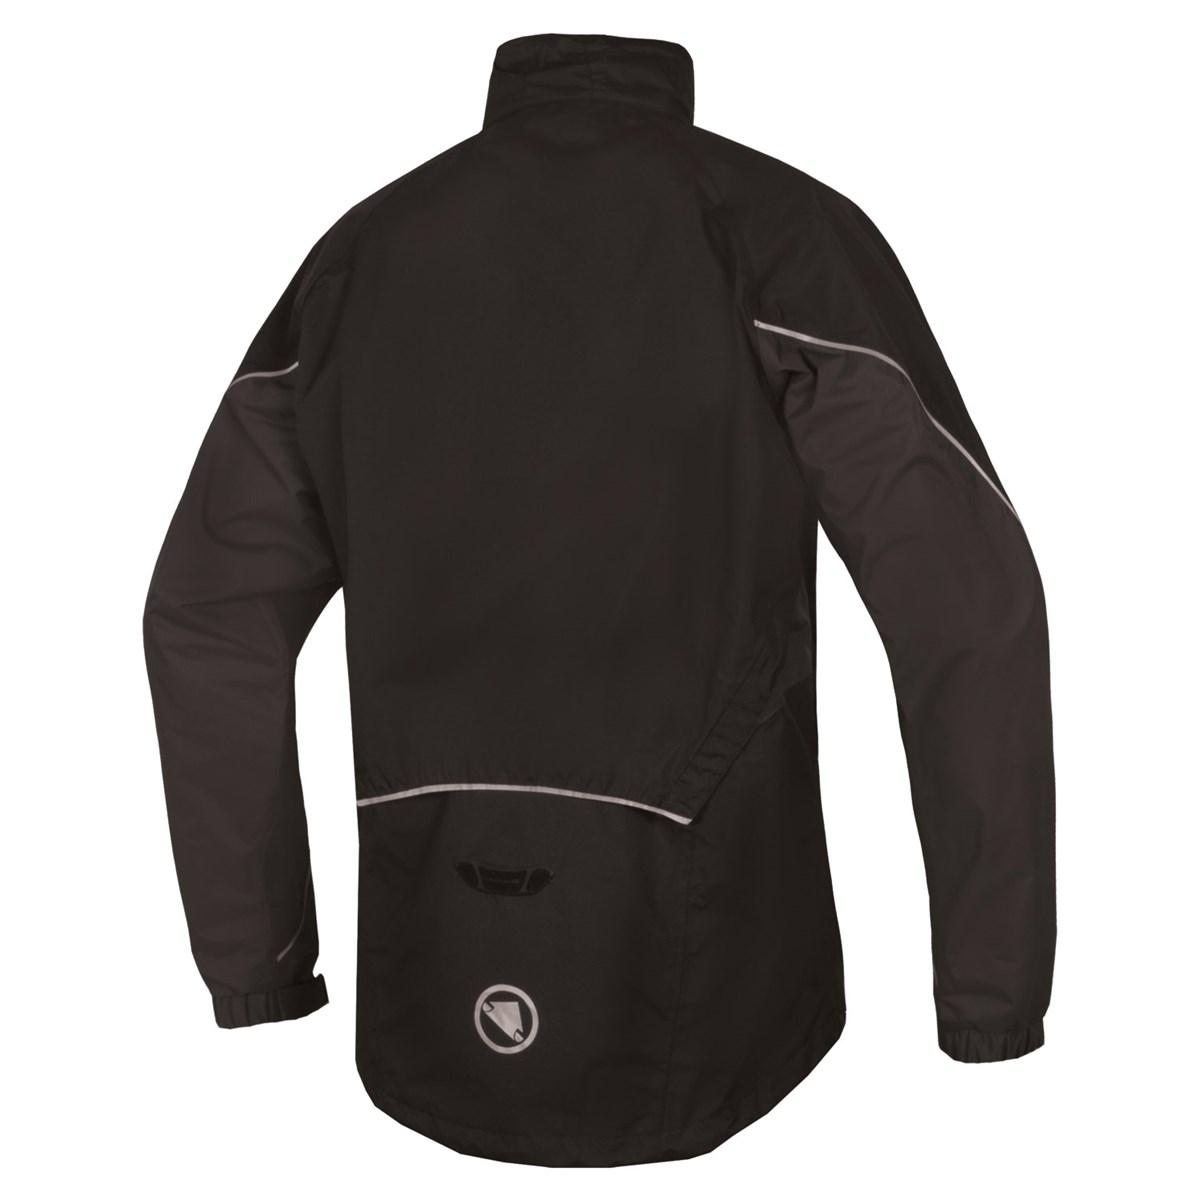 afe6932d2 Endura Hummvee Convertible Black Waterproof Cycling Jacket £99.99